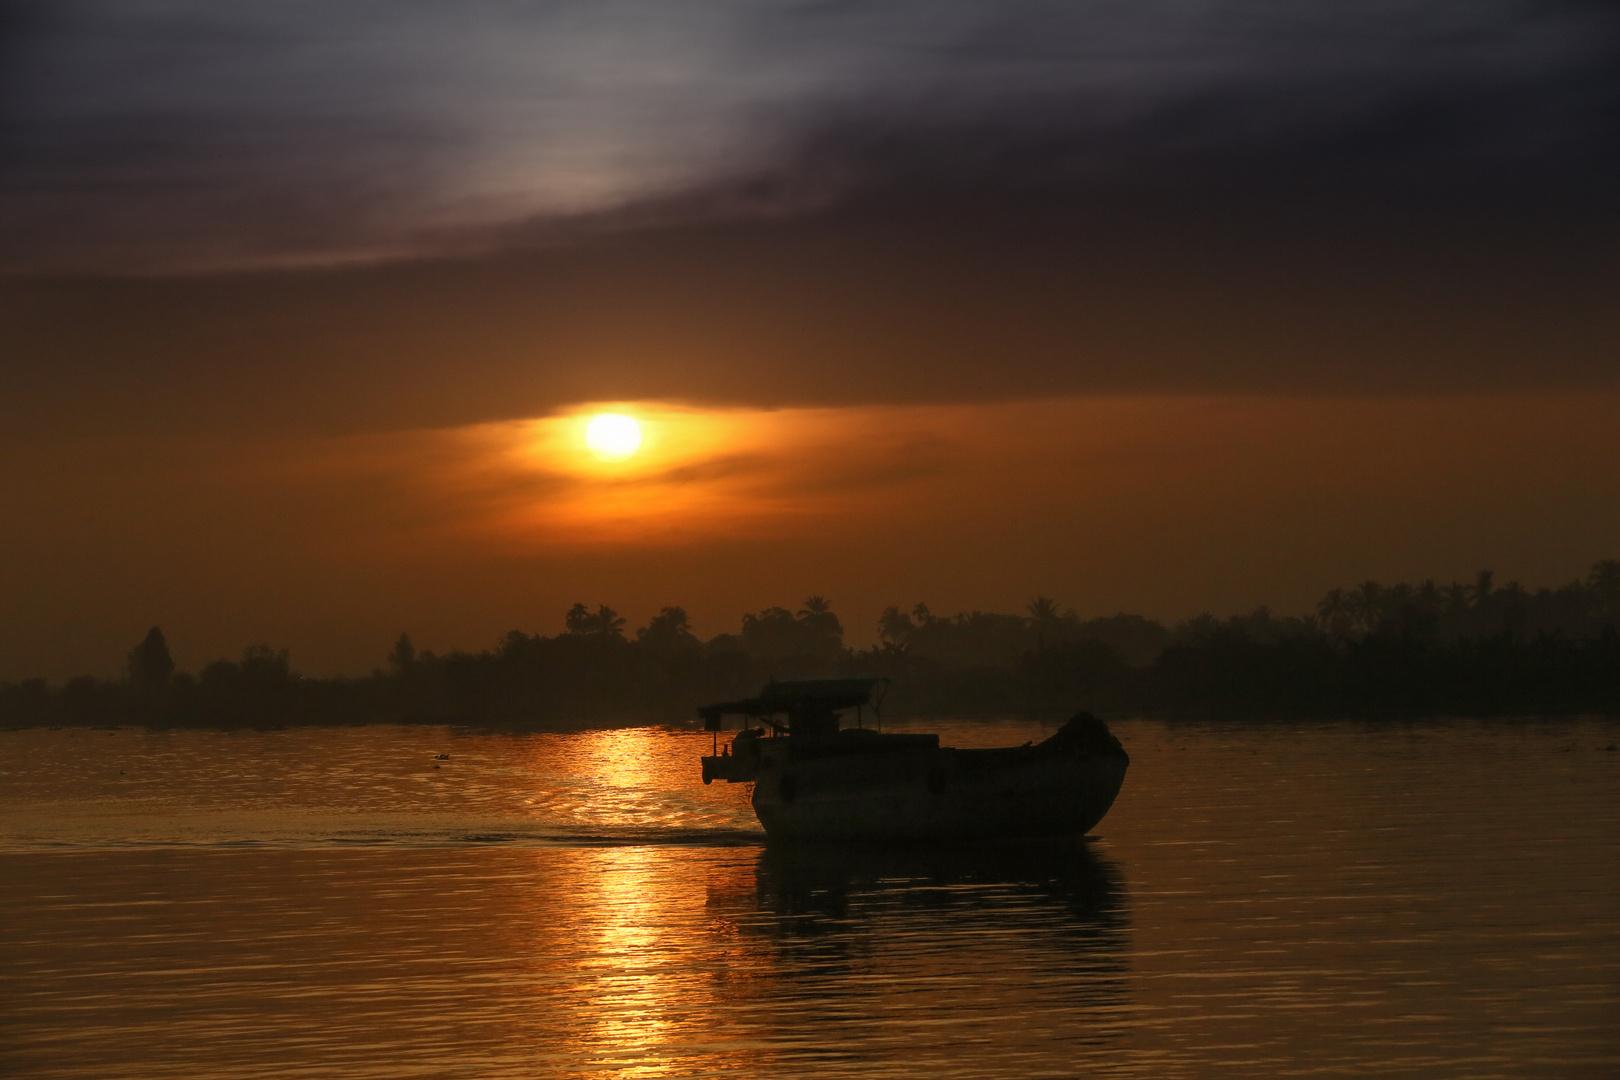 Mekong, Sonnenaufgang mit Boot